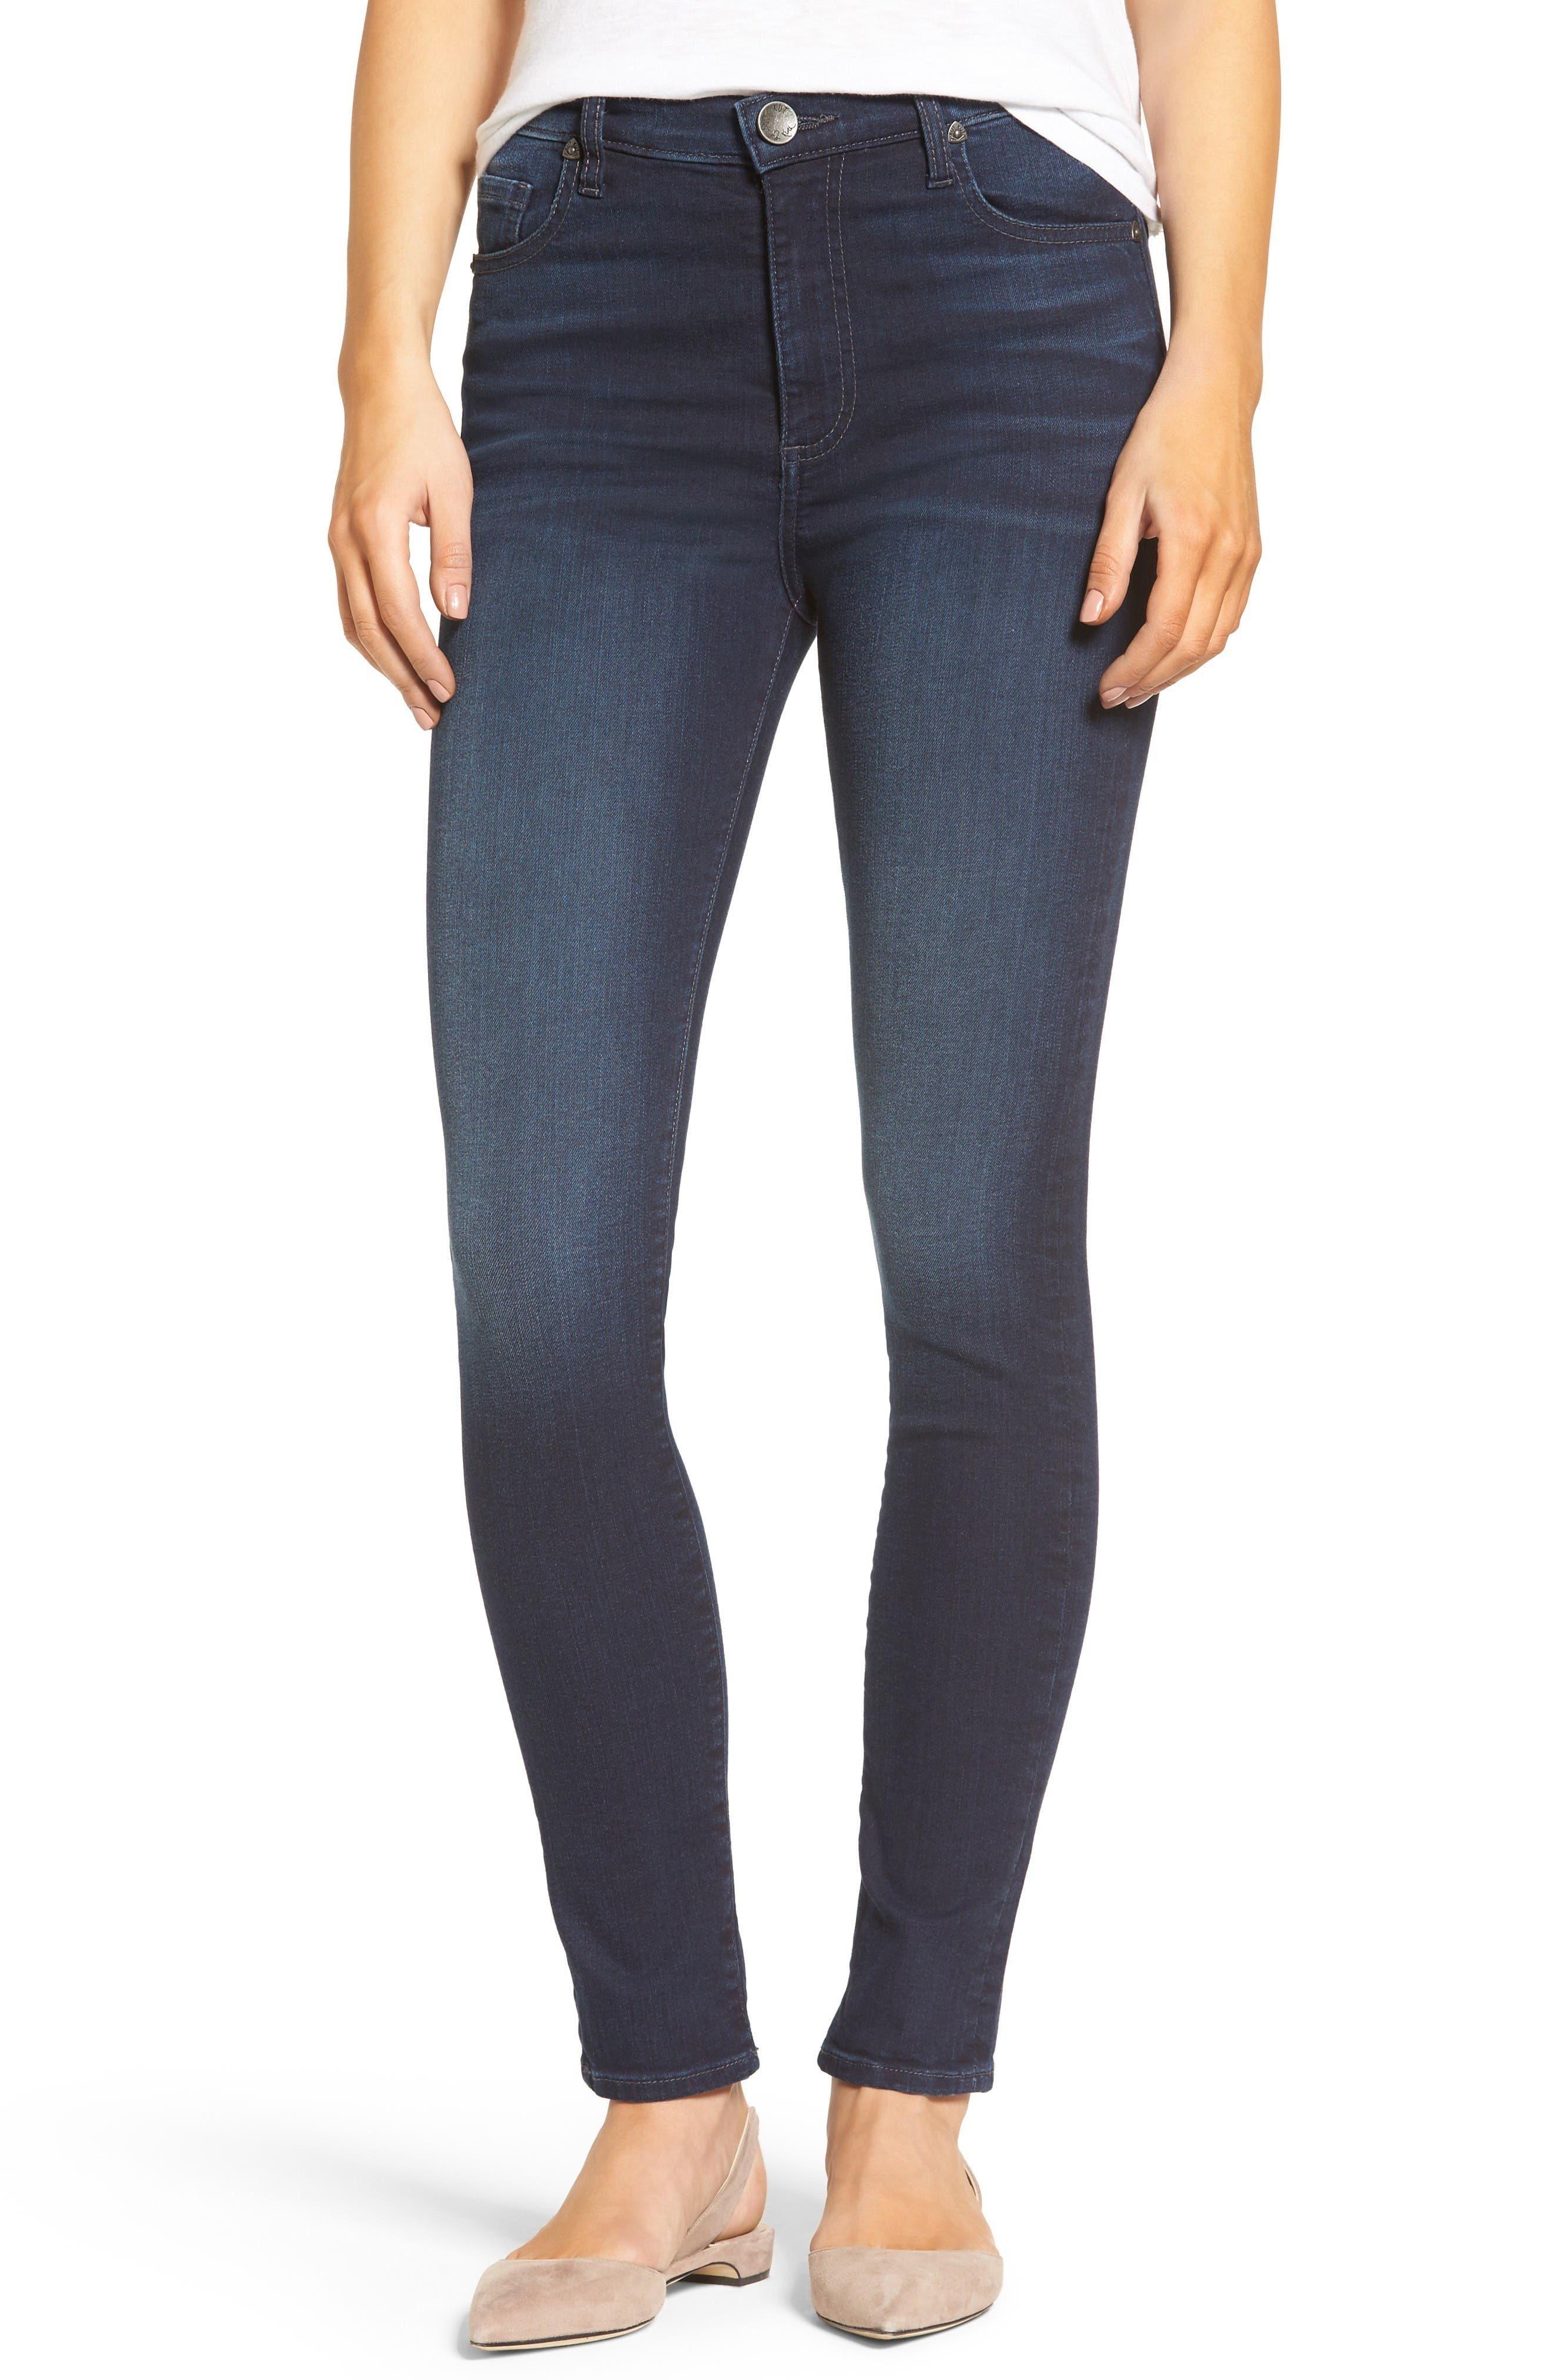 Main Image - KUT from the Kloth Mia High Waist Skinny Jeans (Regular & Petite) (Pacable)